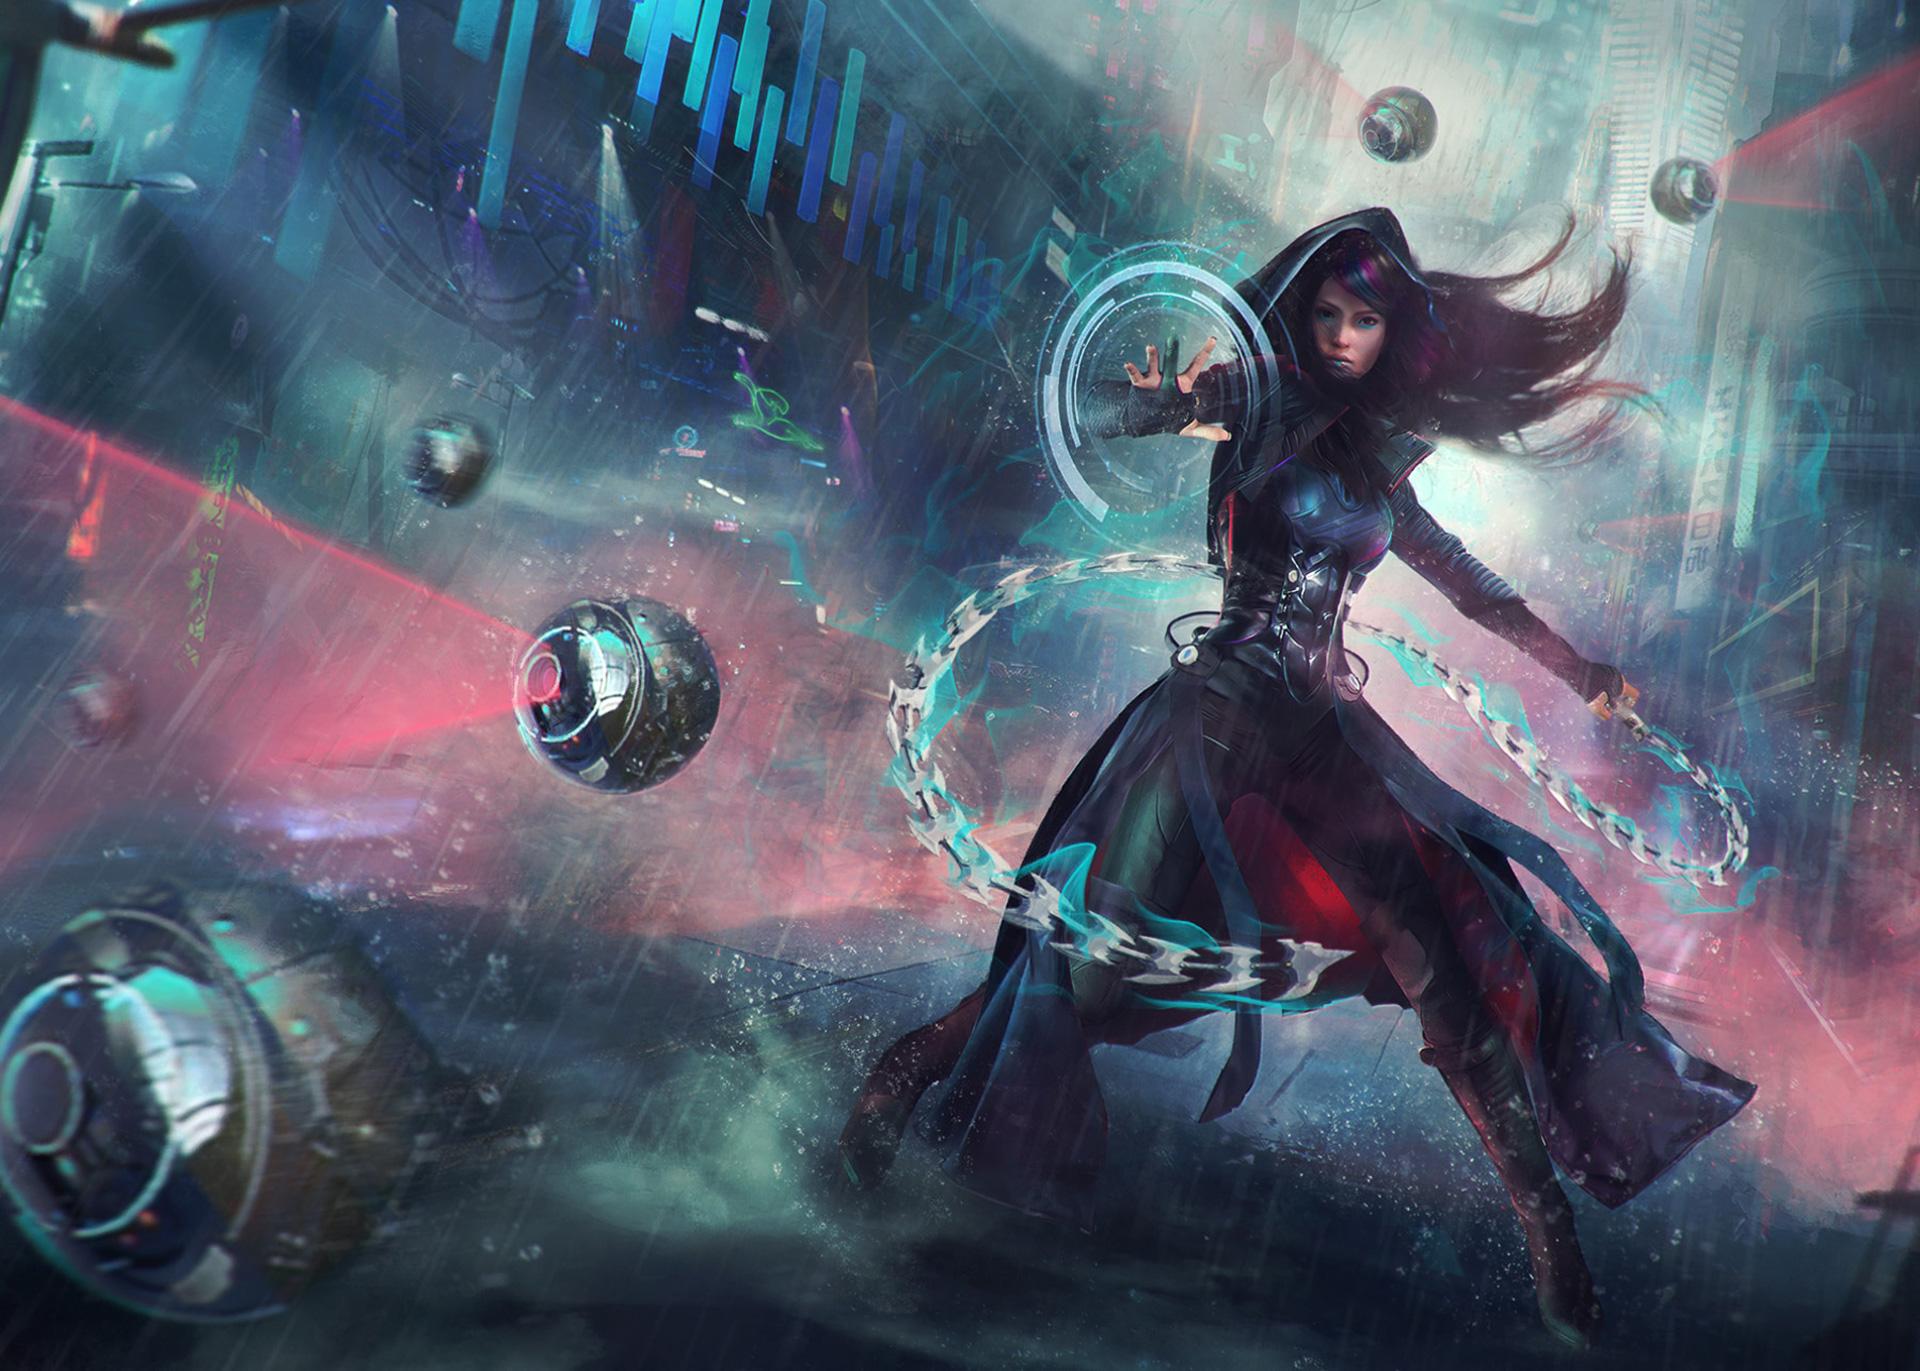 Women Warrior Artwork Sword Rain Cyberpunk Cyberpunk: 2048x1152 Warrior Girl Sci Fi Cyberpunk Futuristic Artwork